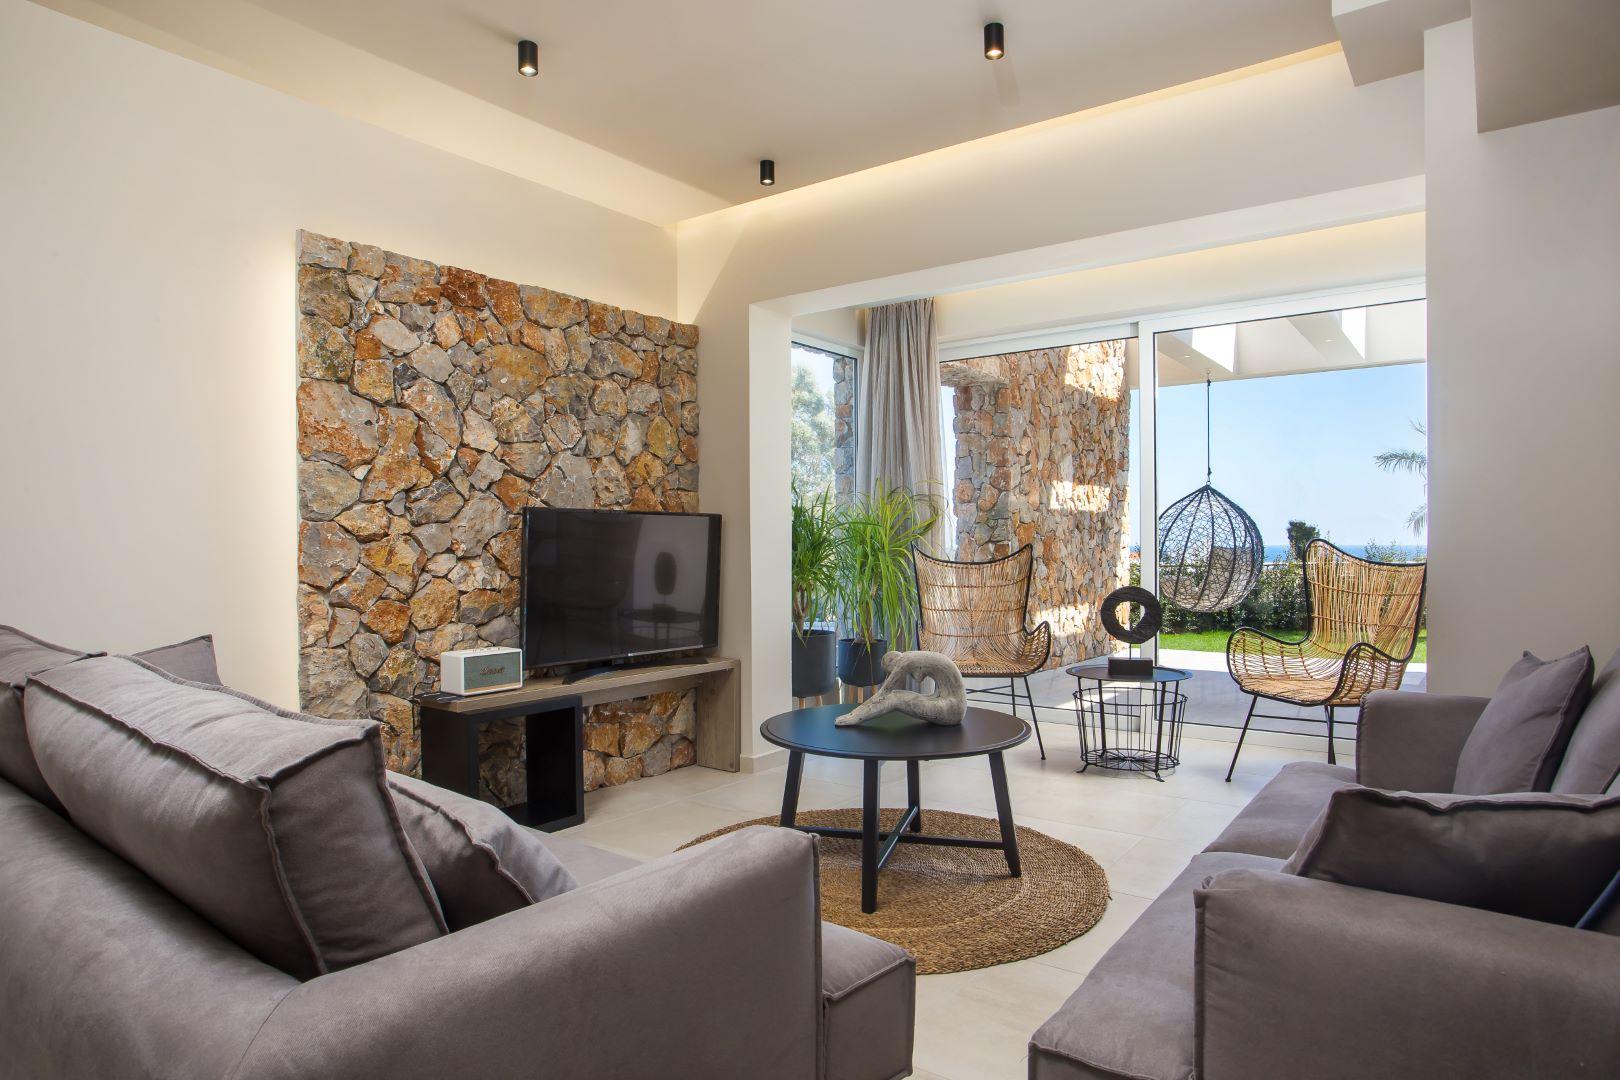 Venezia-Luxury-Living-villas-at-Faliraki-Rhodes-Greece-3